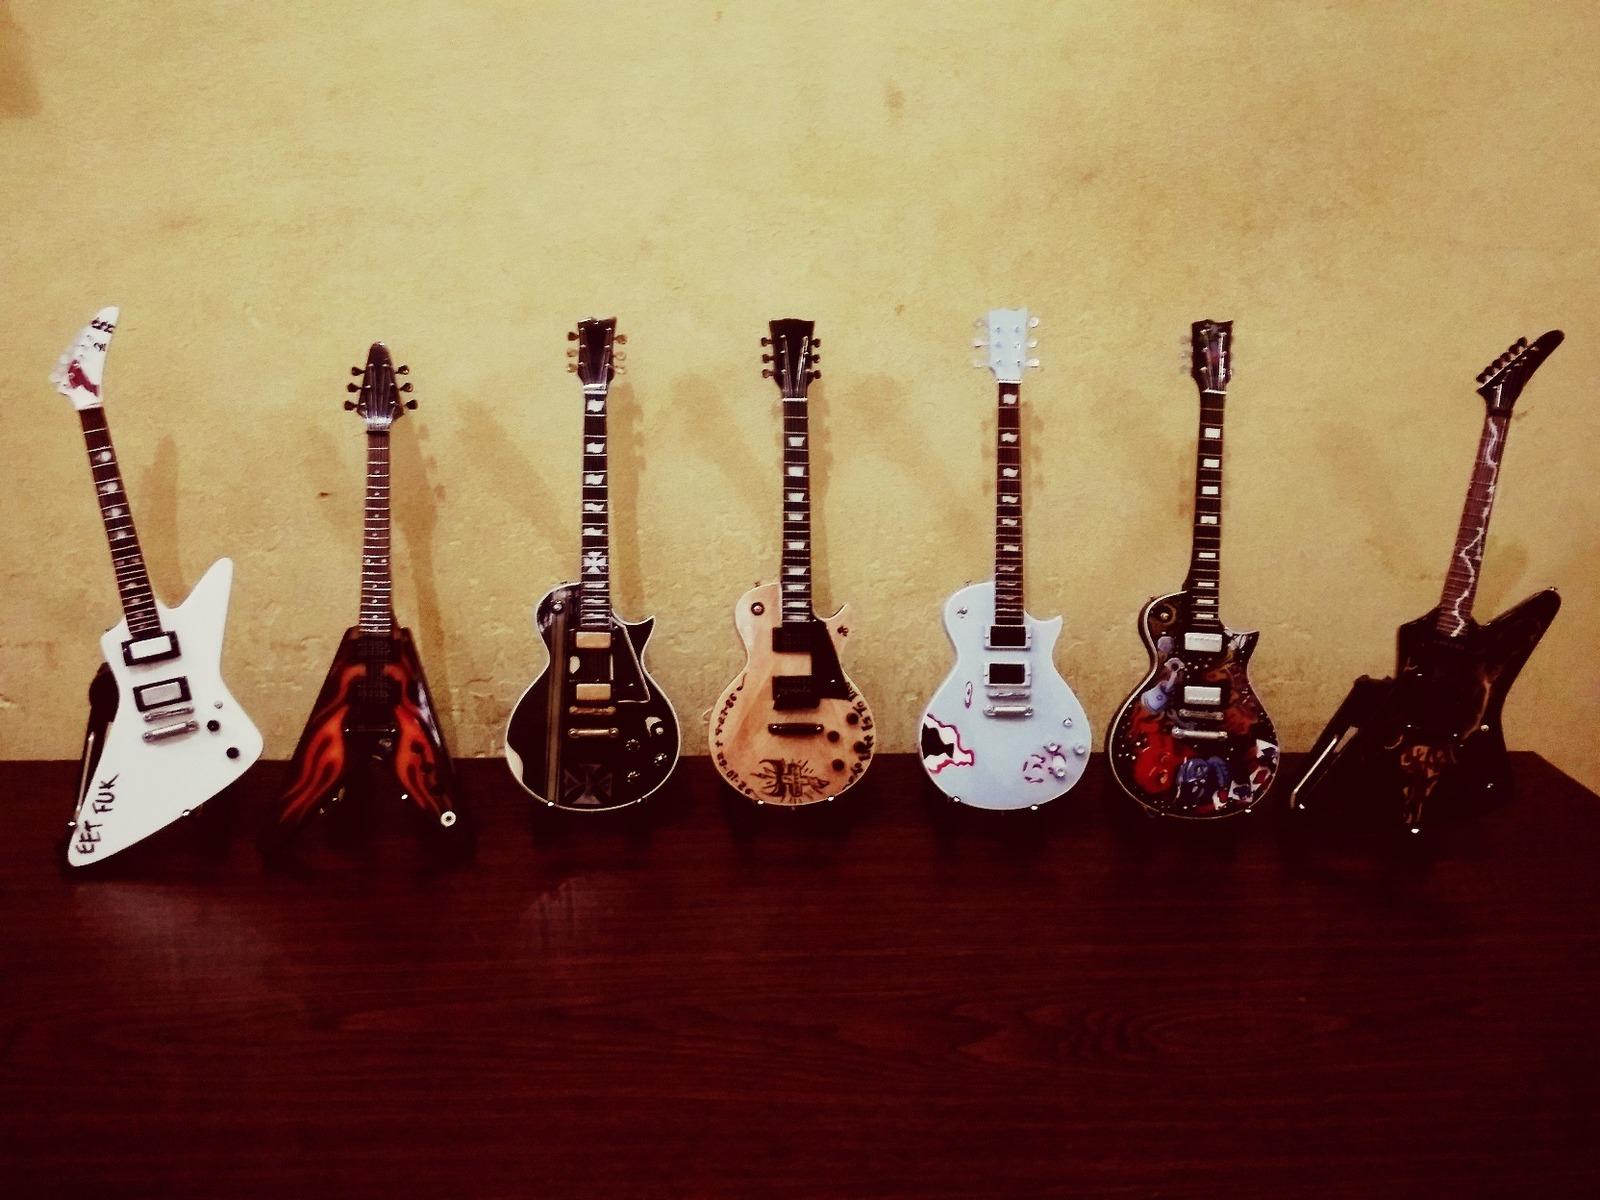 miniature metallica guitar set collection james hetfield 7 guitars set miniatures. Black Bedroom Furniture Sets. Home Design Ideas